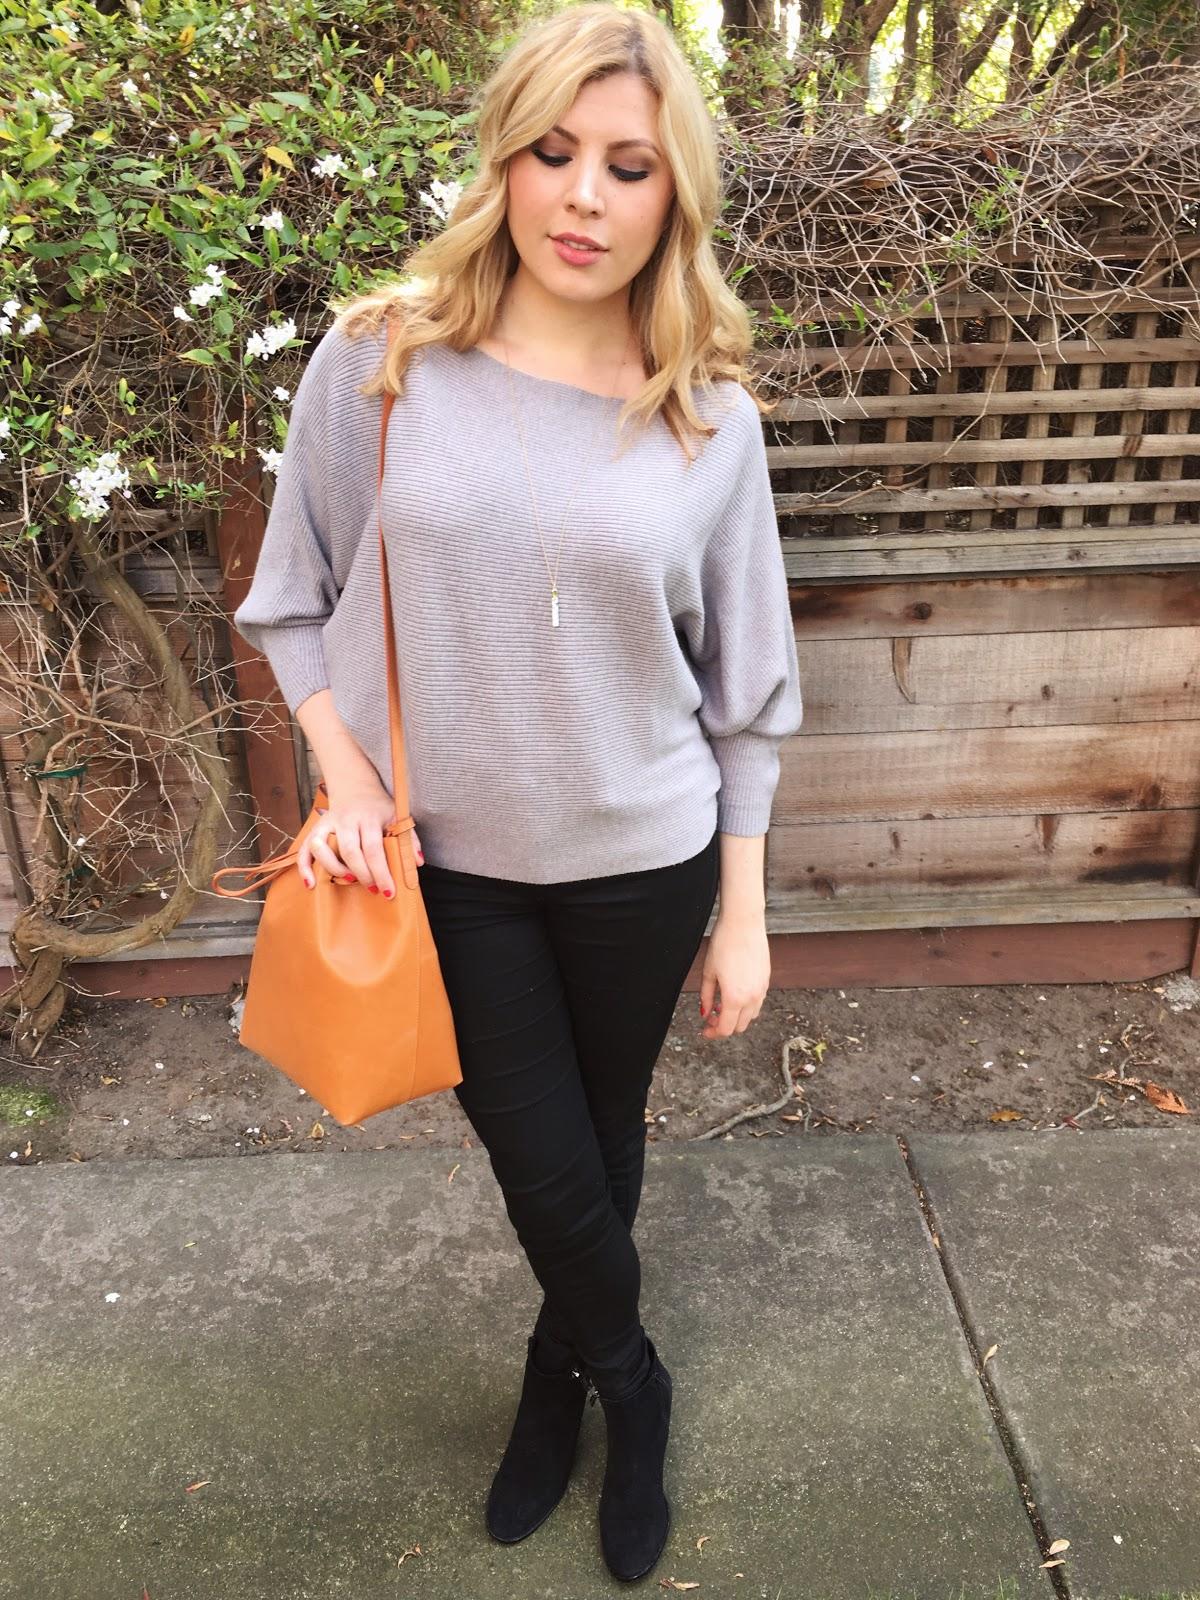 Zara Light Grey Batwing Sweater Review